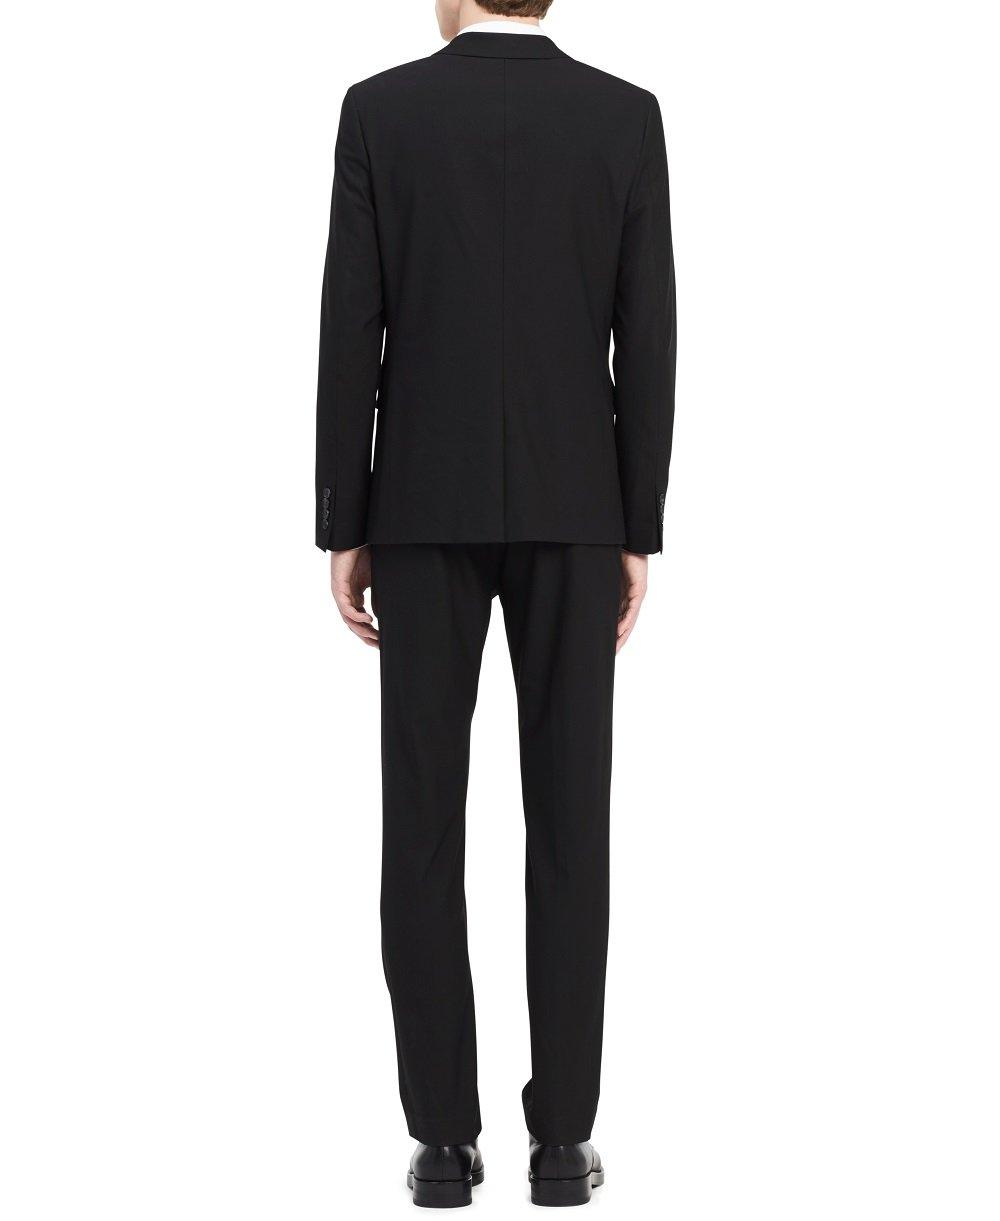 Calvin Klein Men's Infinite Slim Fit Suit Jacket 4-Way Stretch, Black, SMALL R by Calvin Klein (Image #2)